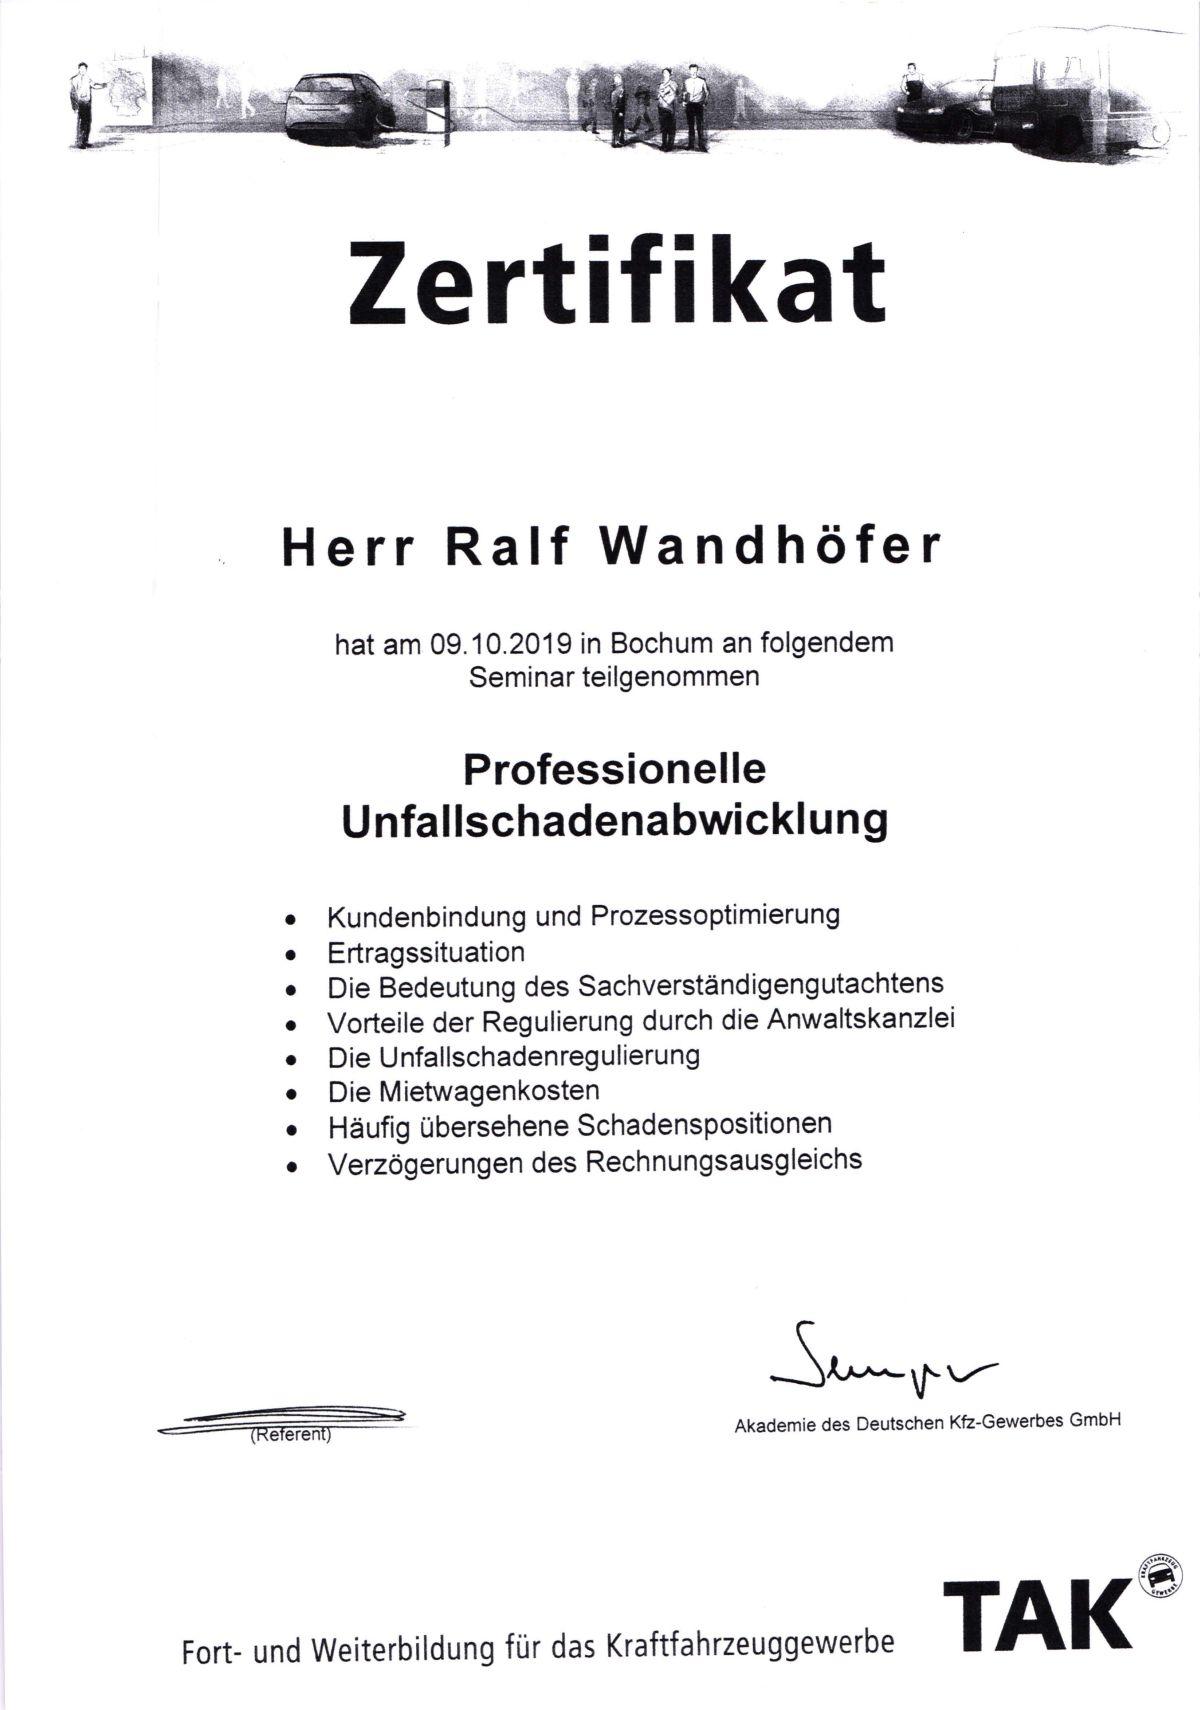 Ralf_Wandhöfer_Zertifikat_013